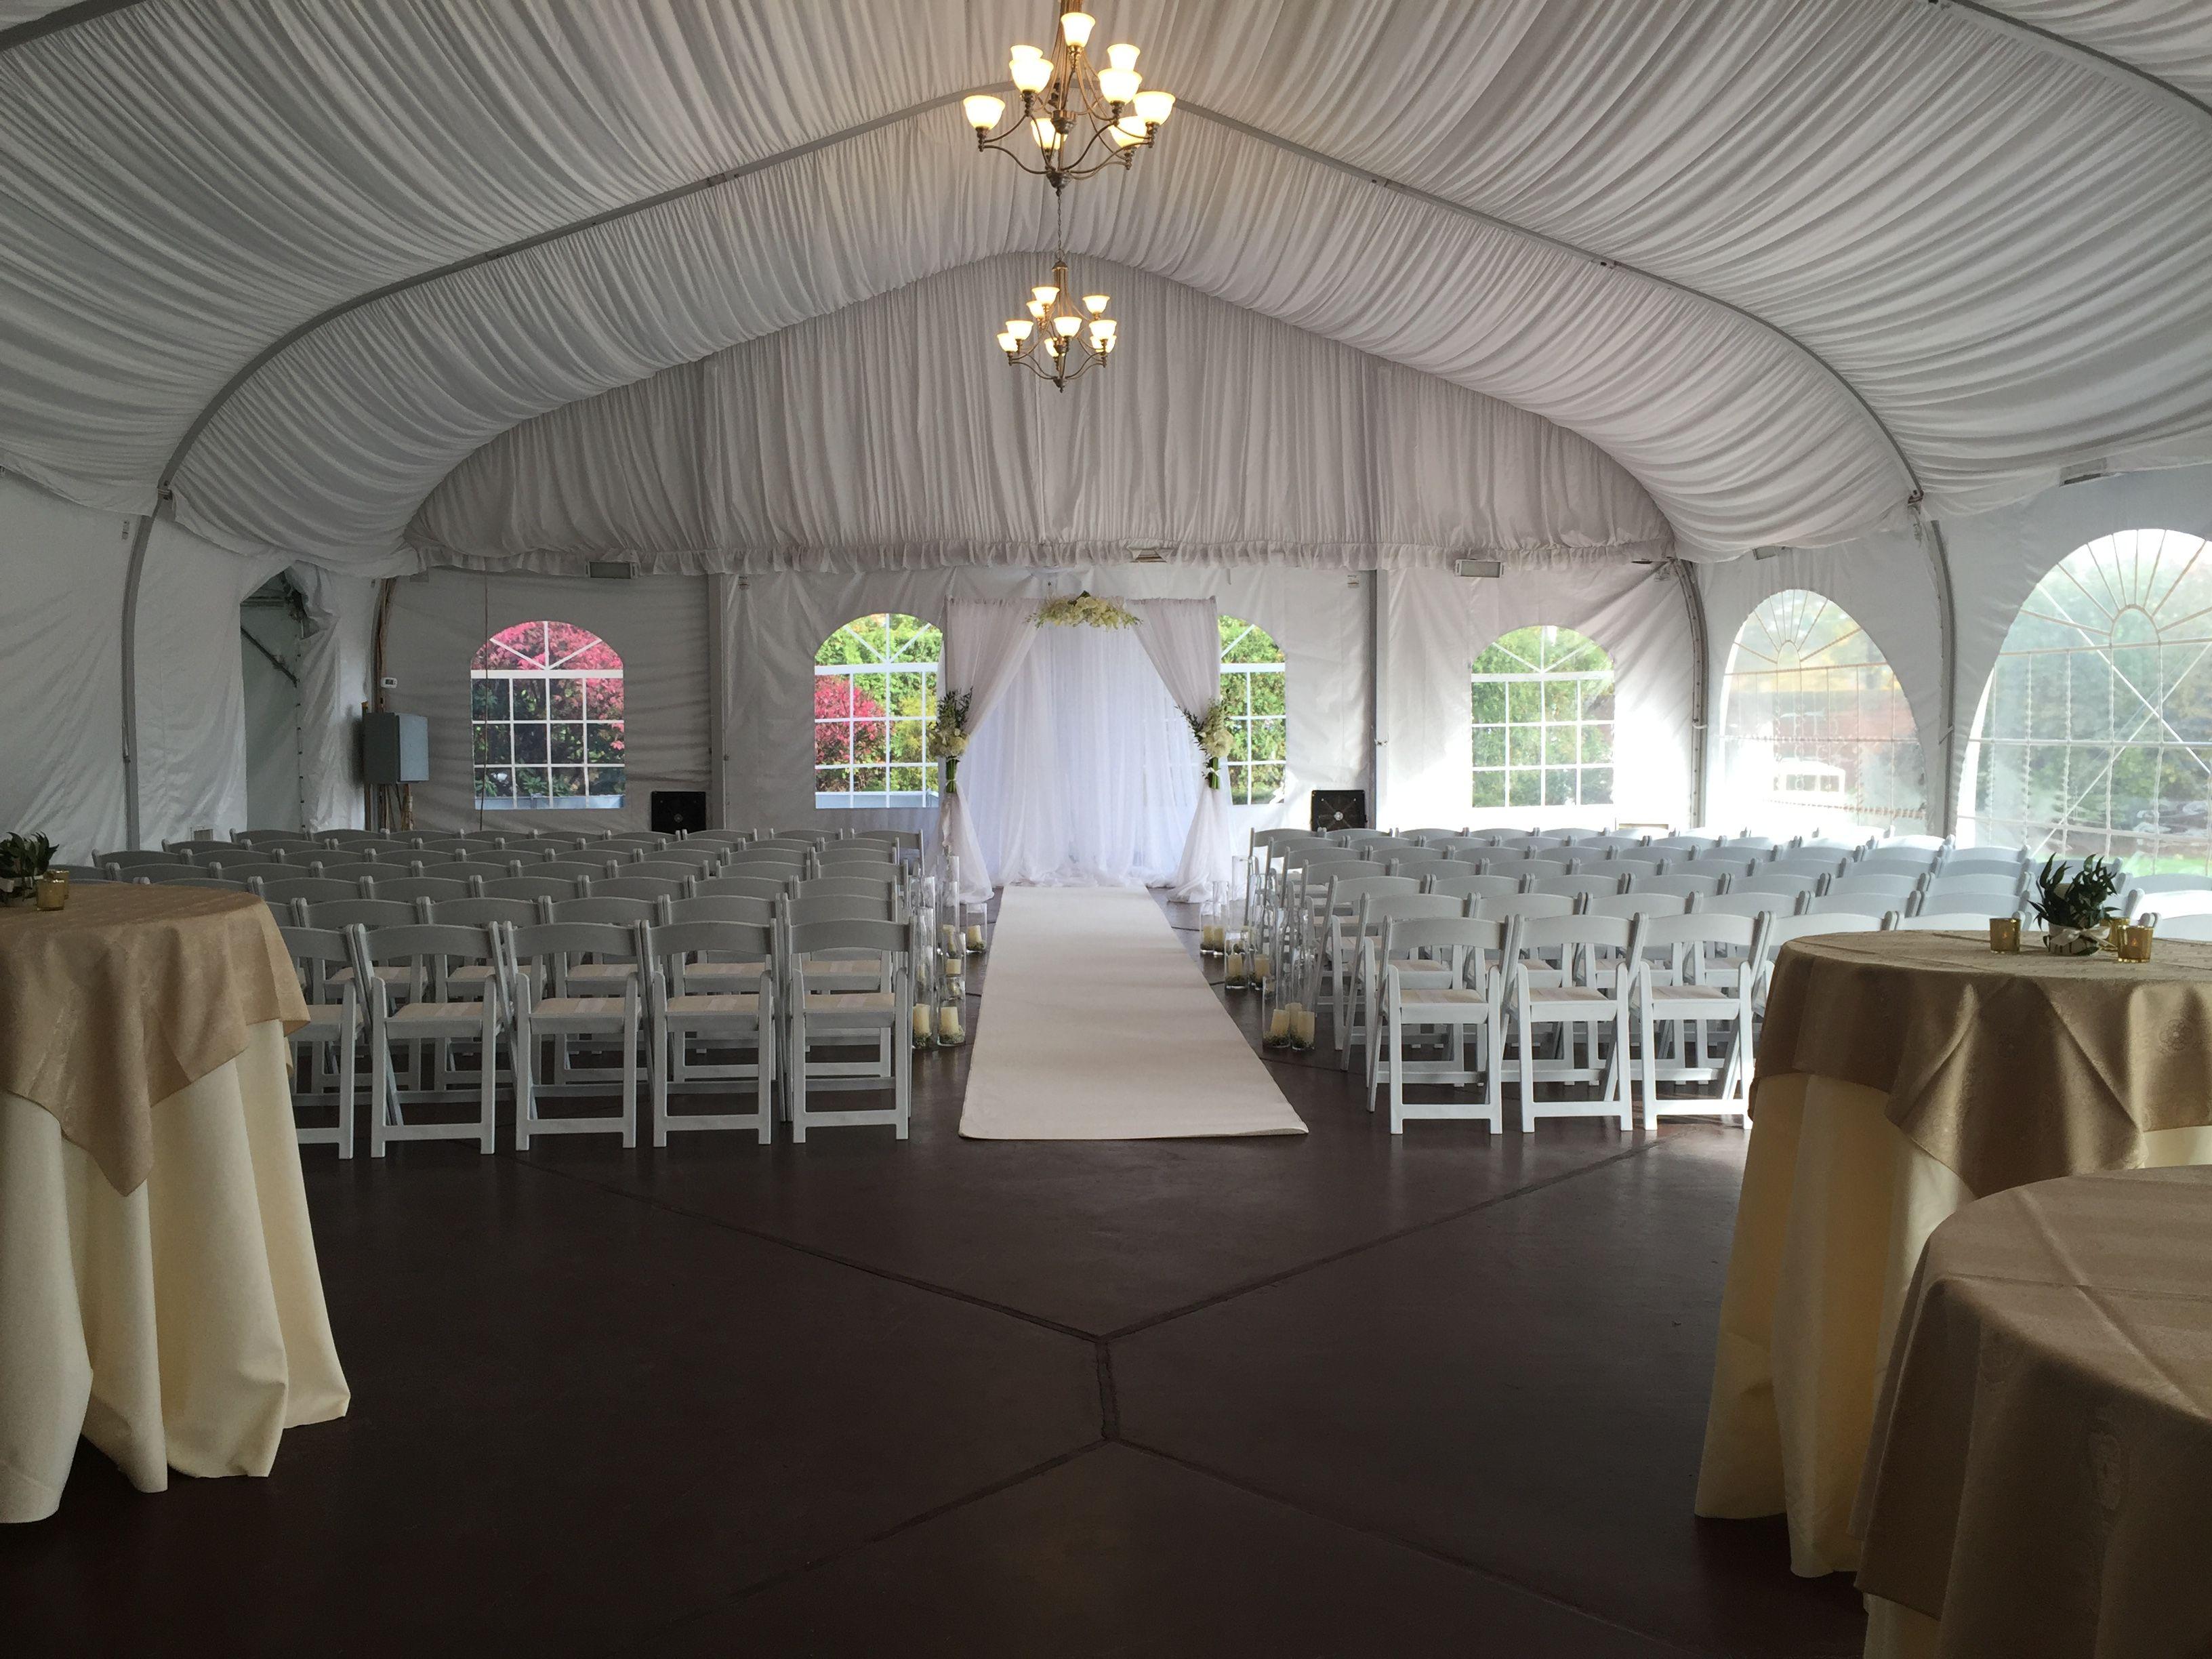 Find Inexpensive Wedding Venues In Ma At Atria Edgartown Hyatt Regency Cambridge MA Worcester Art Museum And New England Aquarium